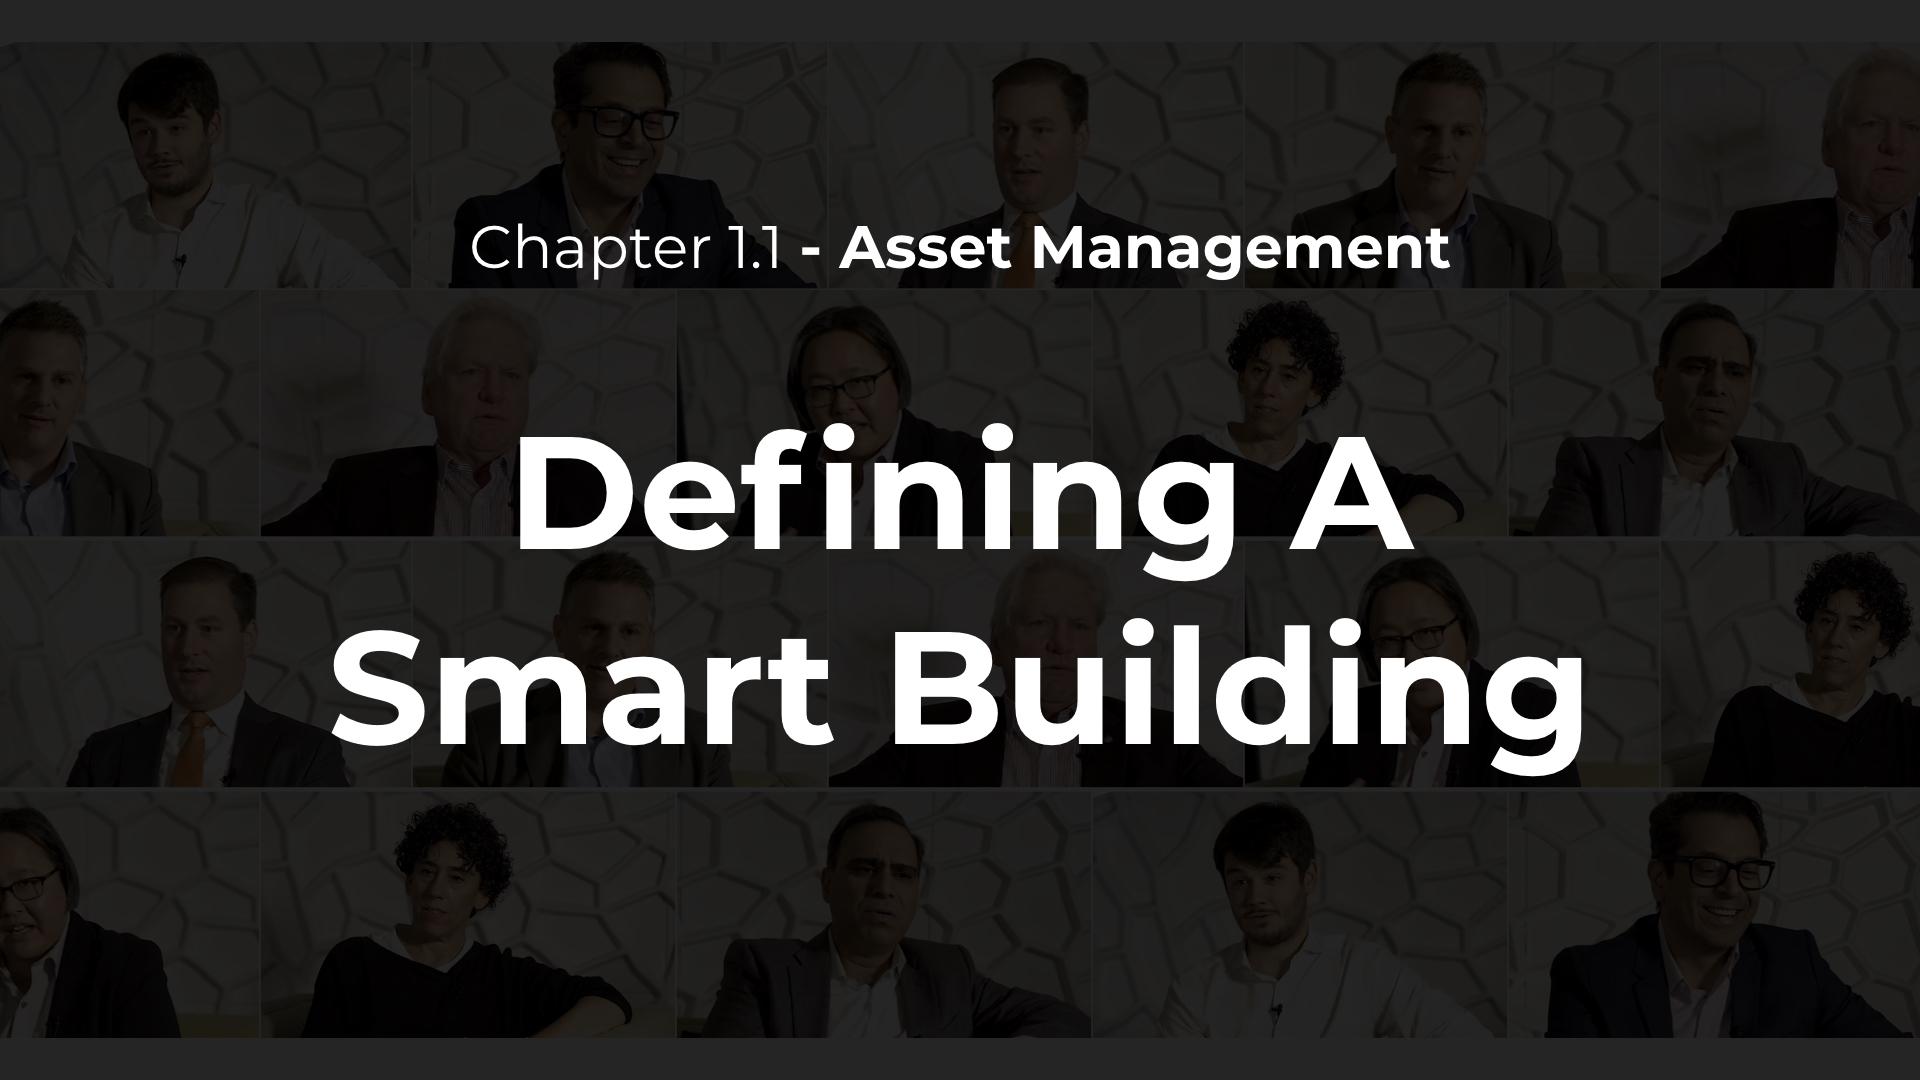 1.1 - Defining A Smart Building